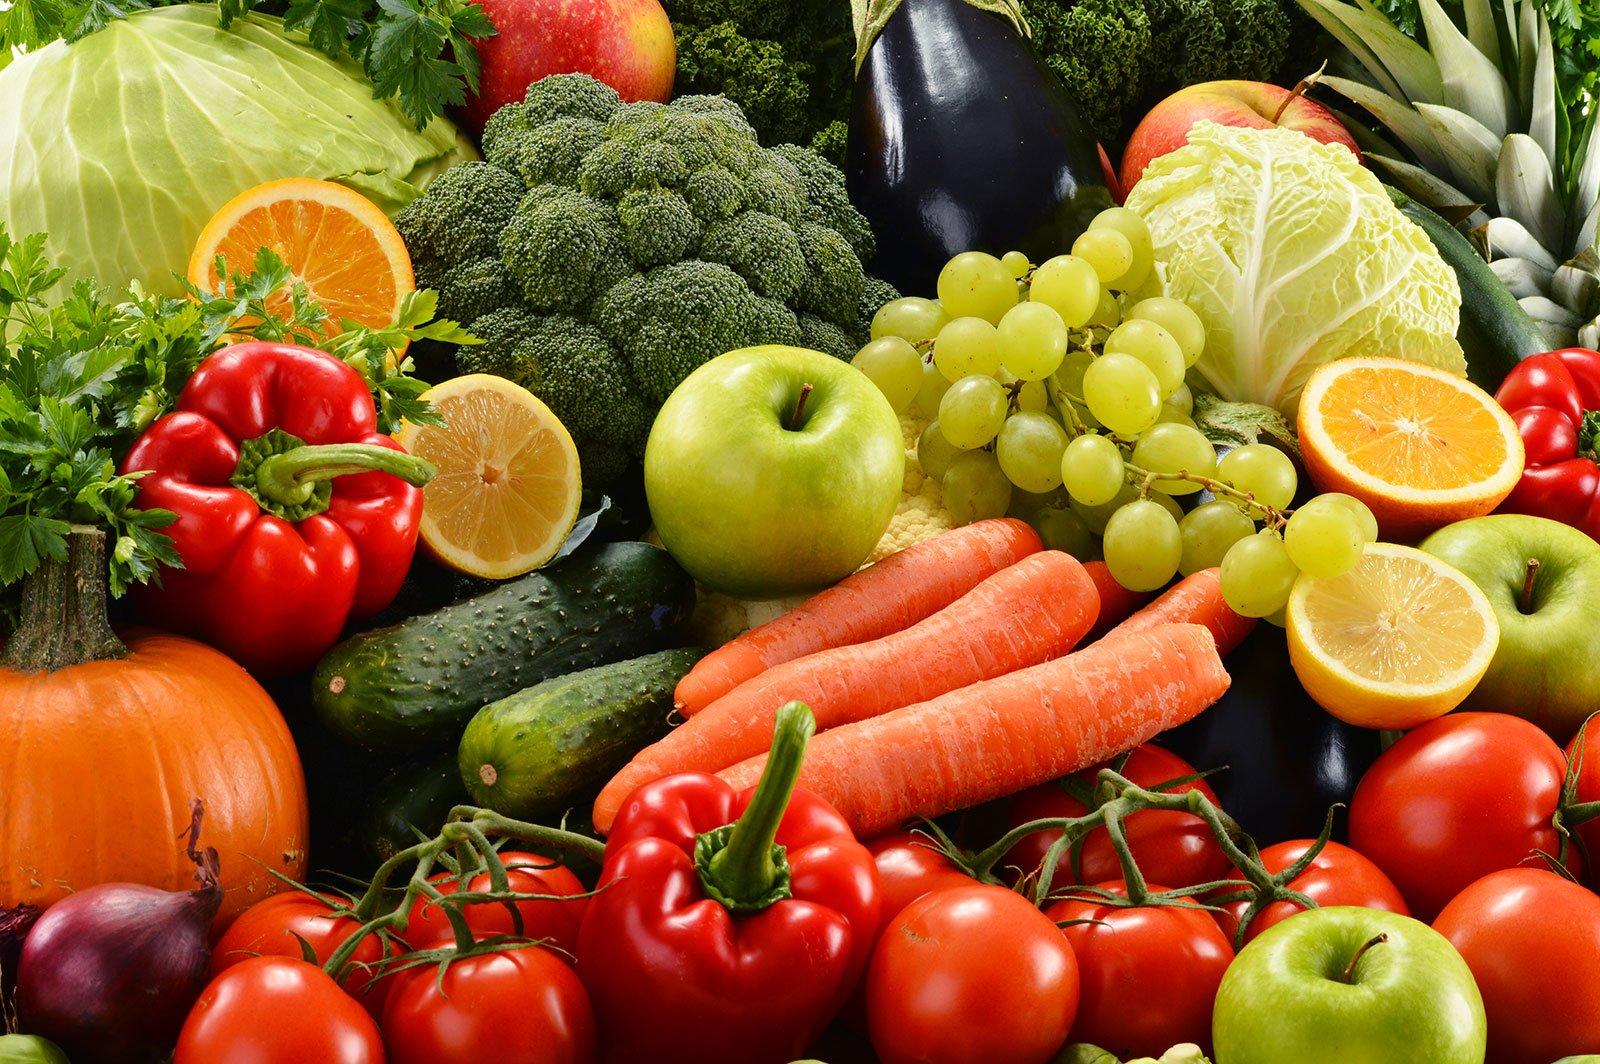 varietà di frutta e verdura